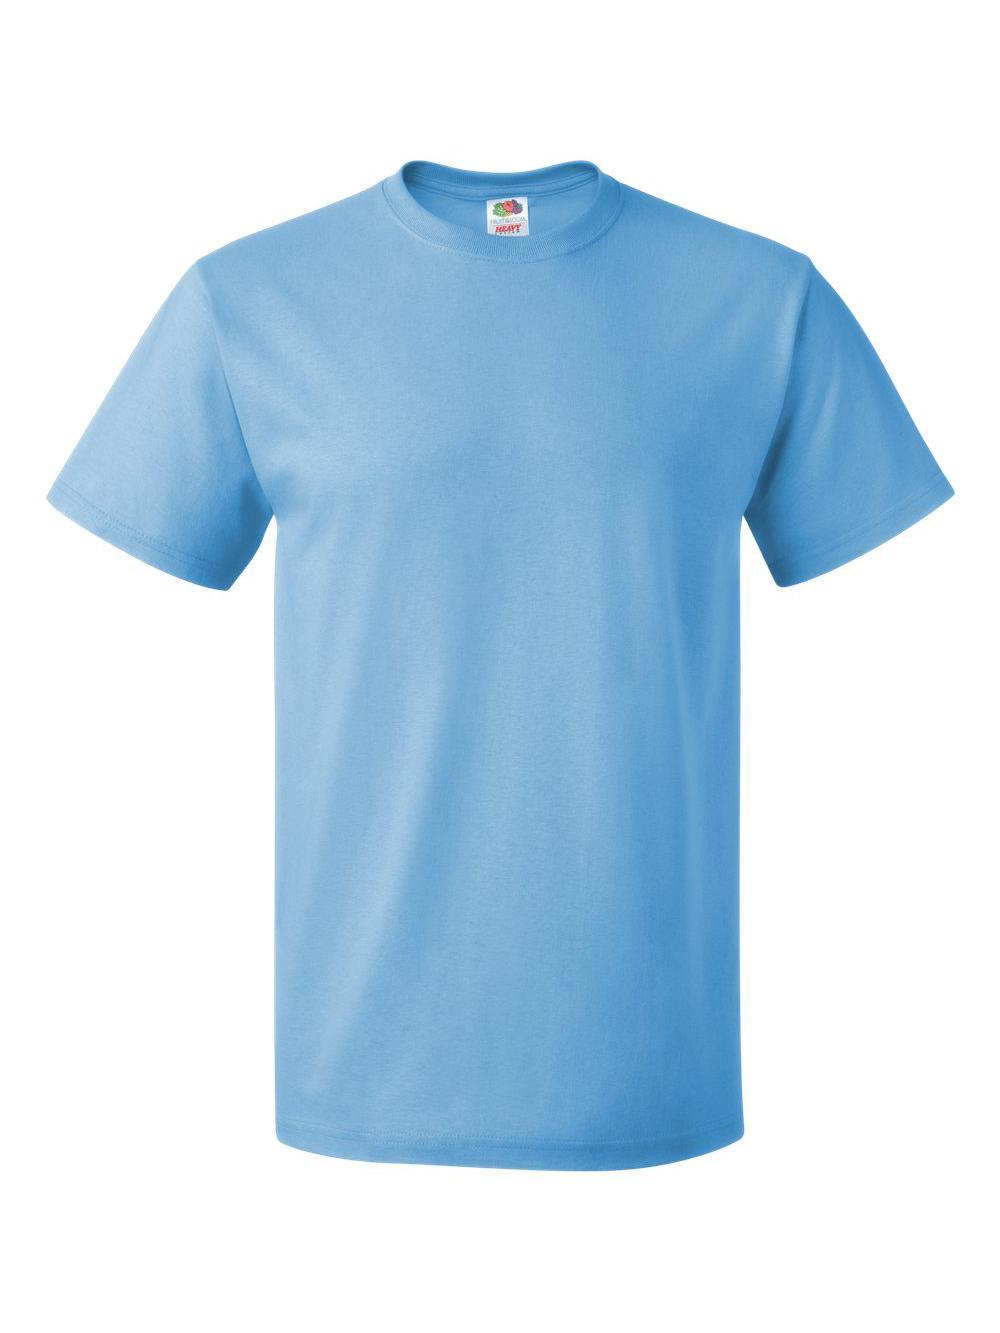 Fruit-of-the-Loom-HD-Cotton-Short-Sleeve-T-Shirt-3930R thumbnail 6